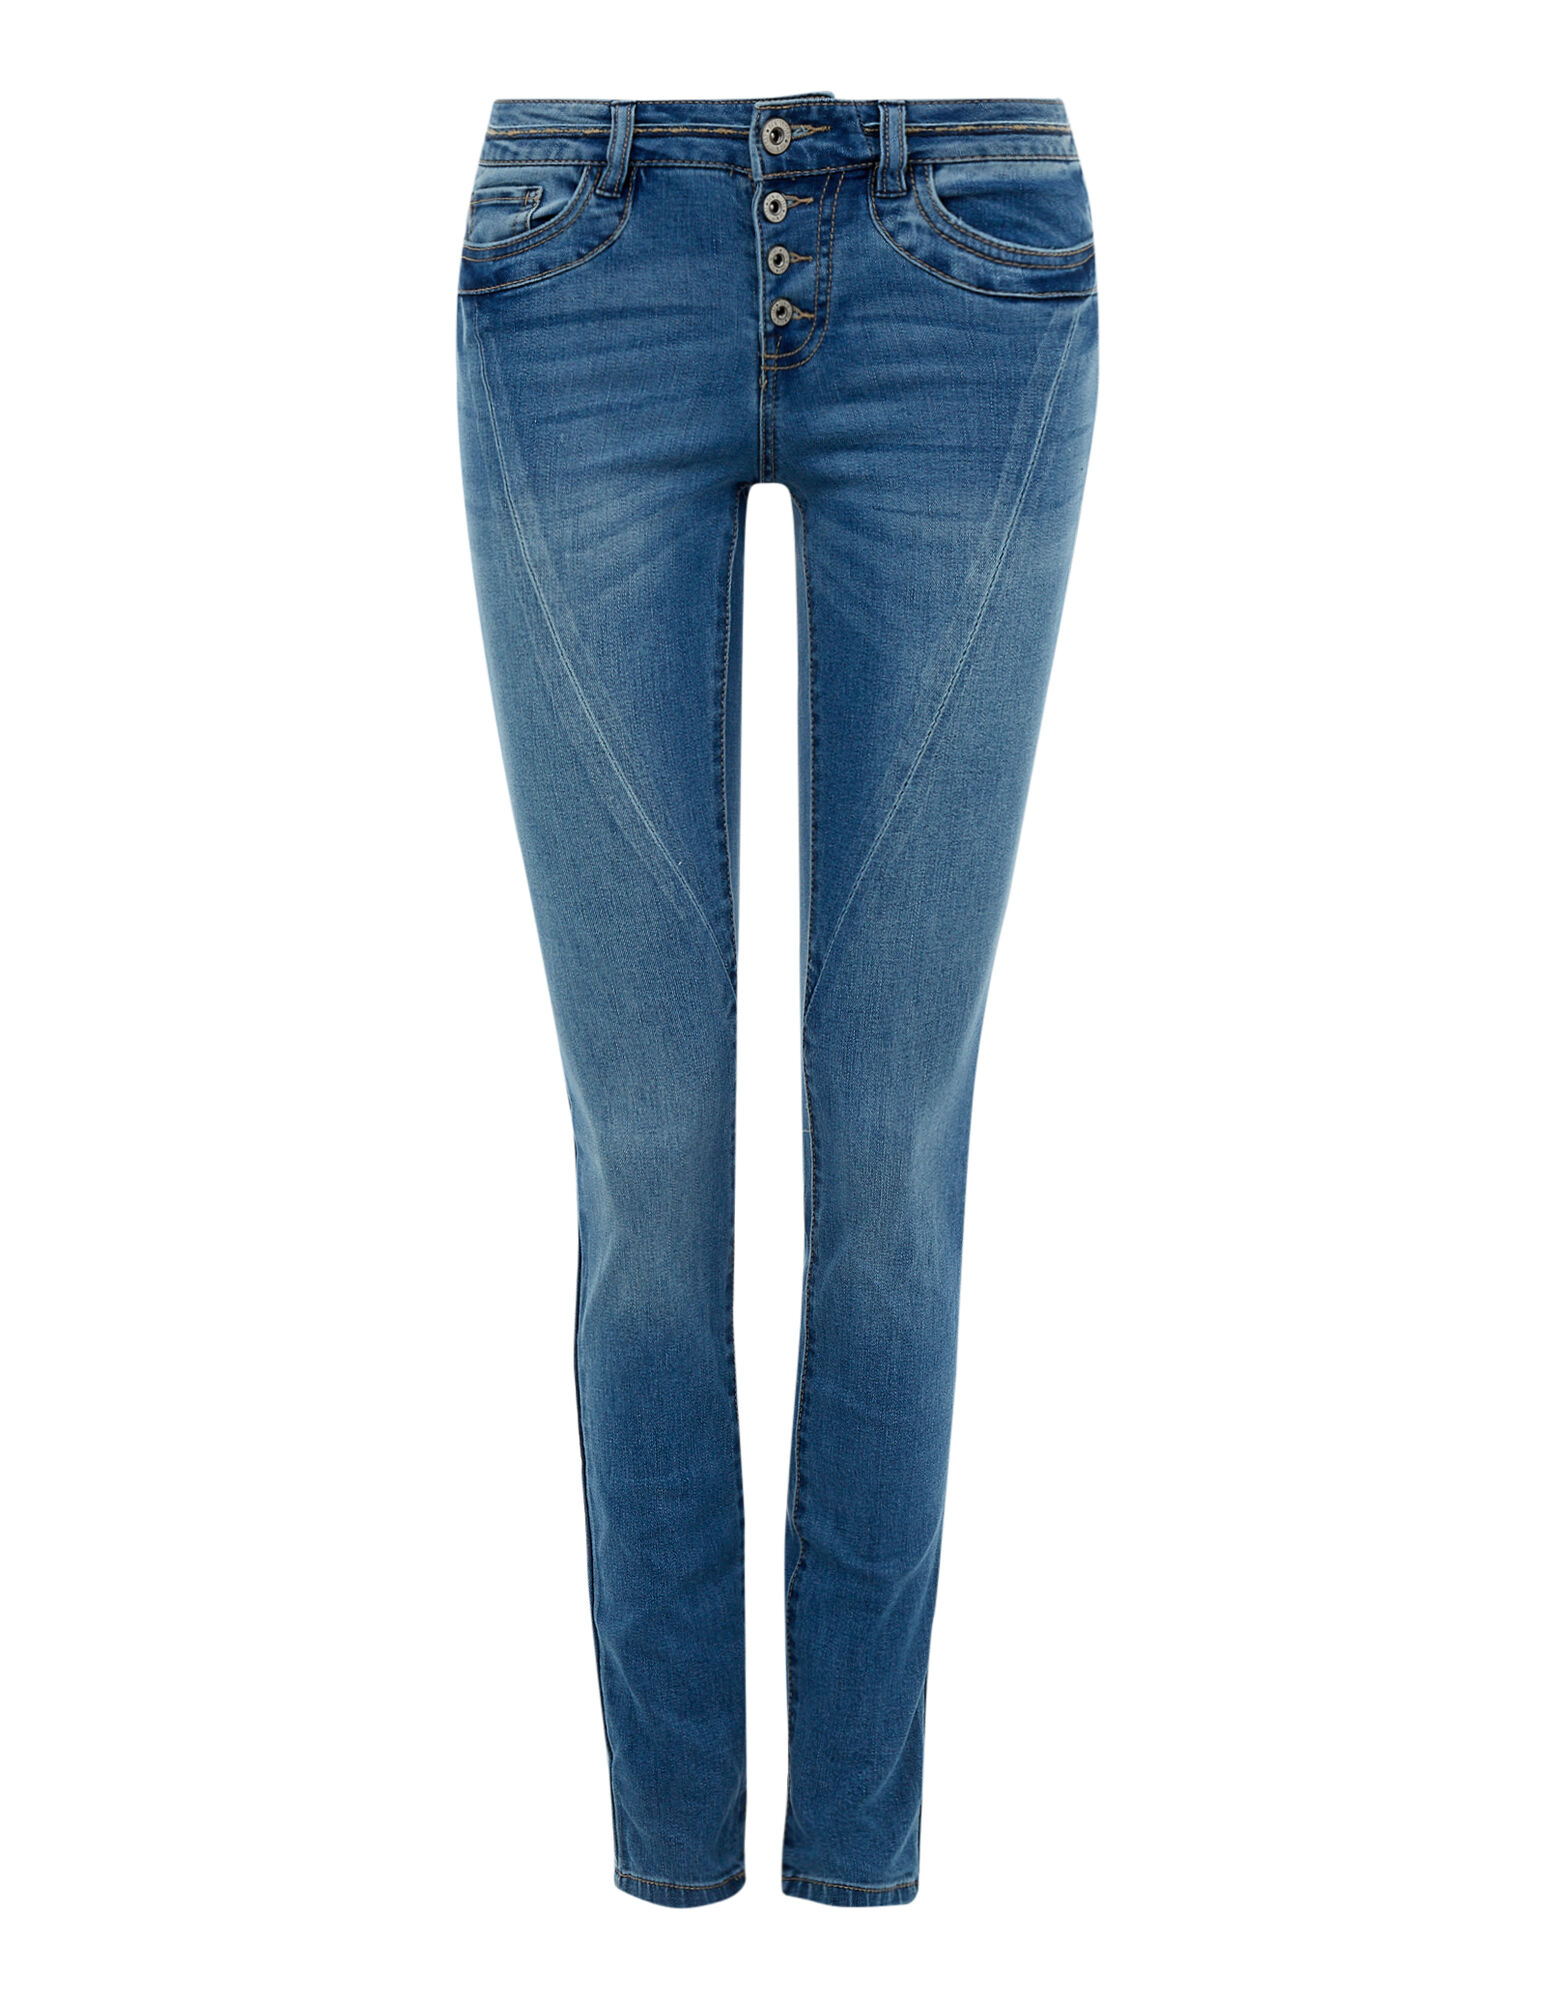 Damen Stone Washed Skinny Fit Jeans mit Knopfleiste